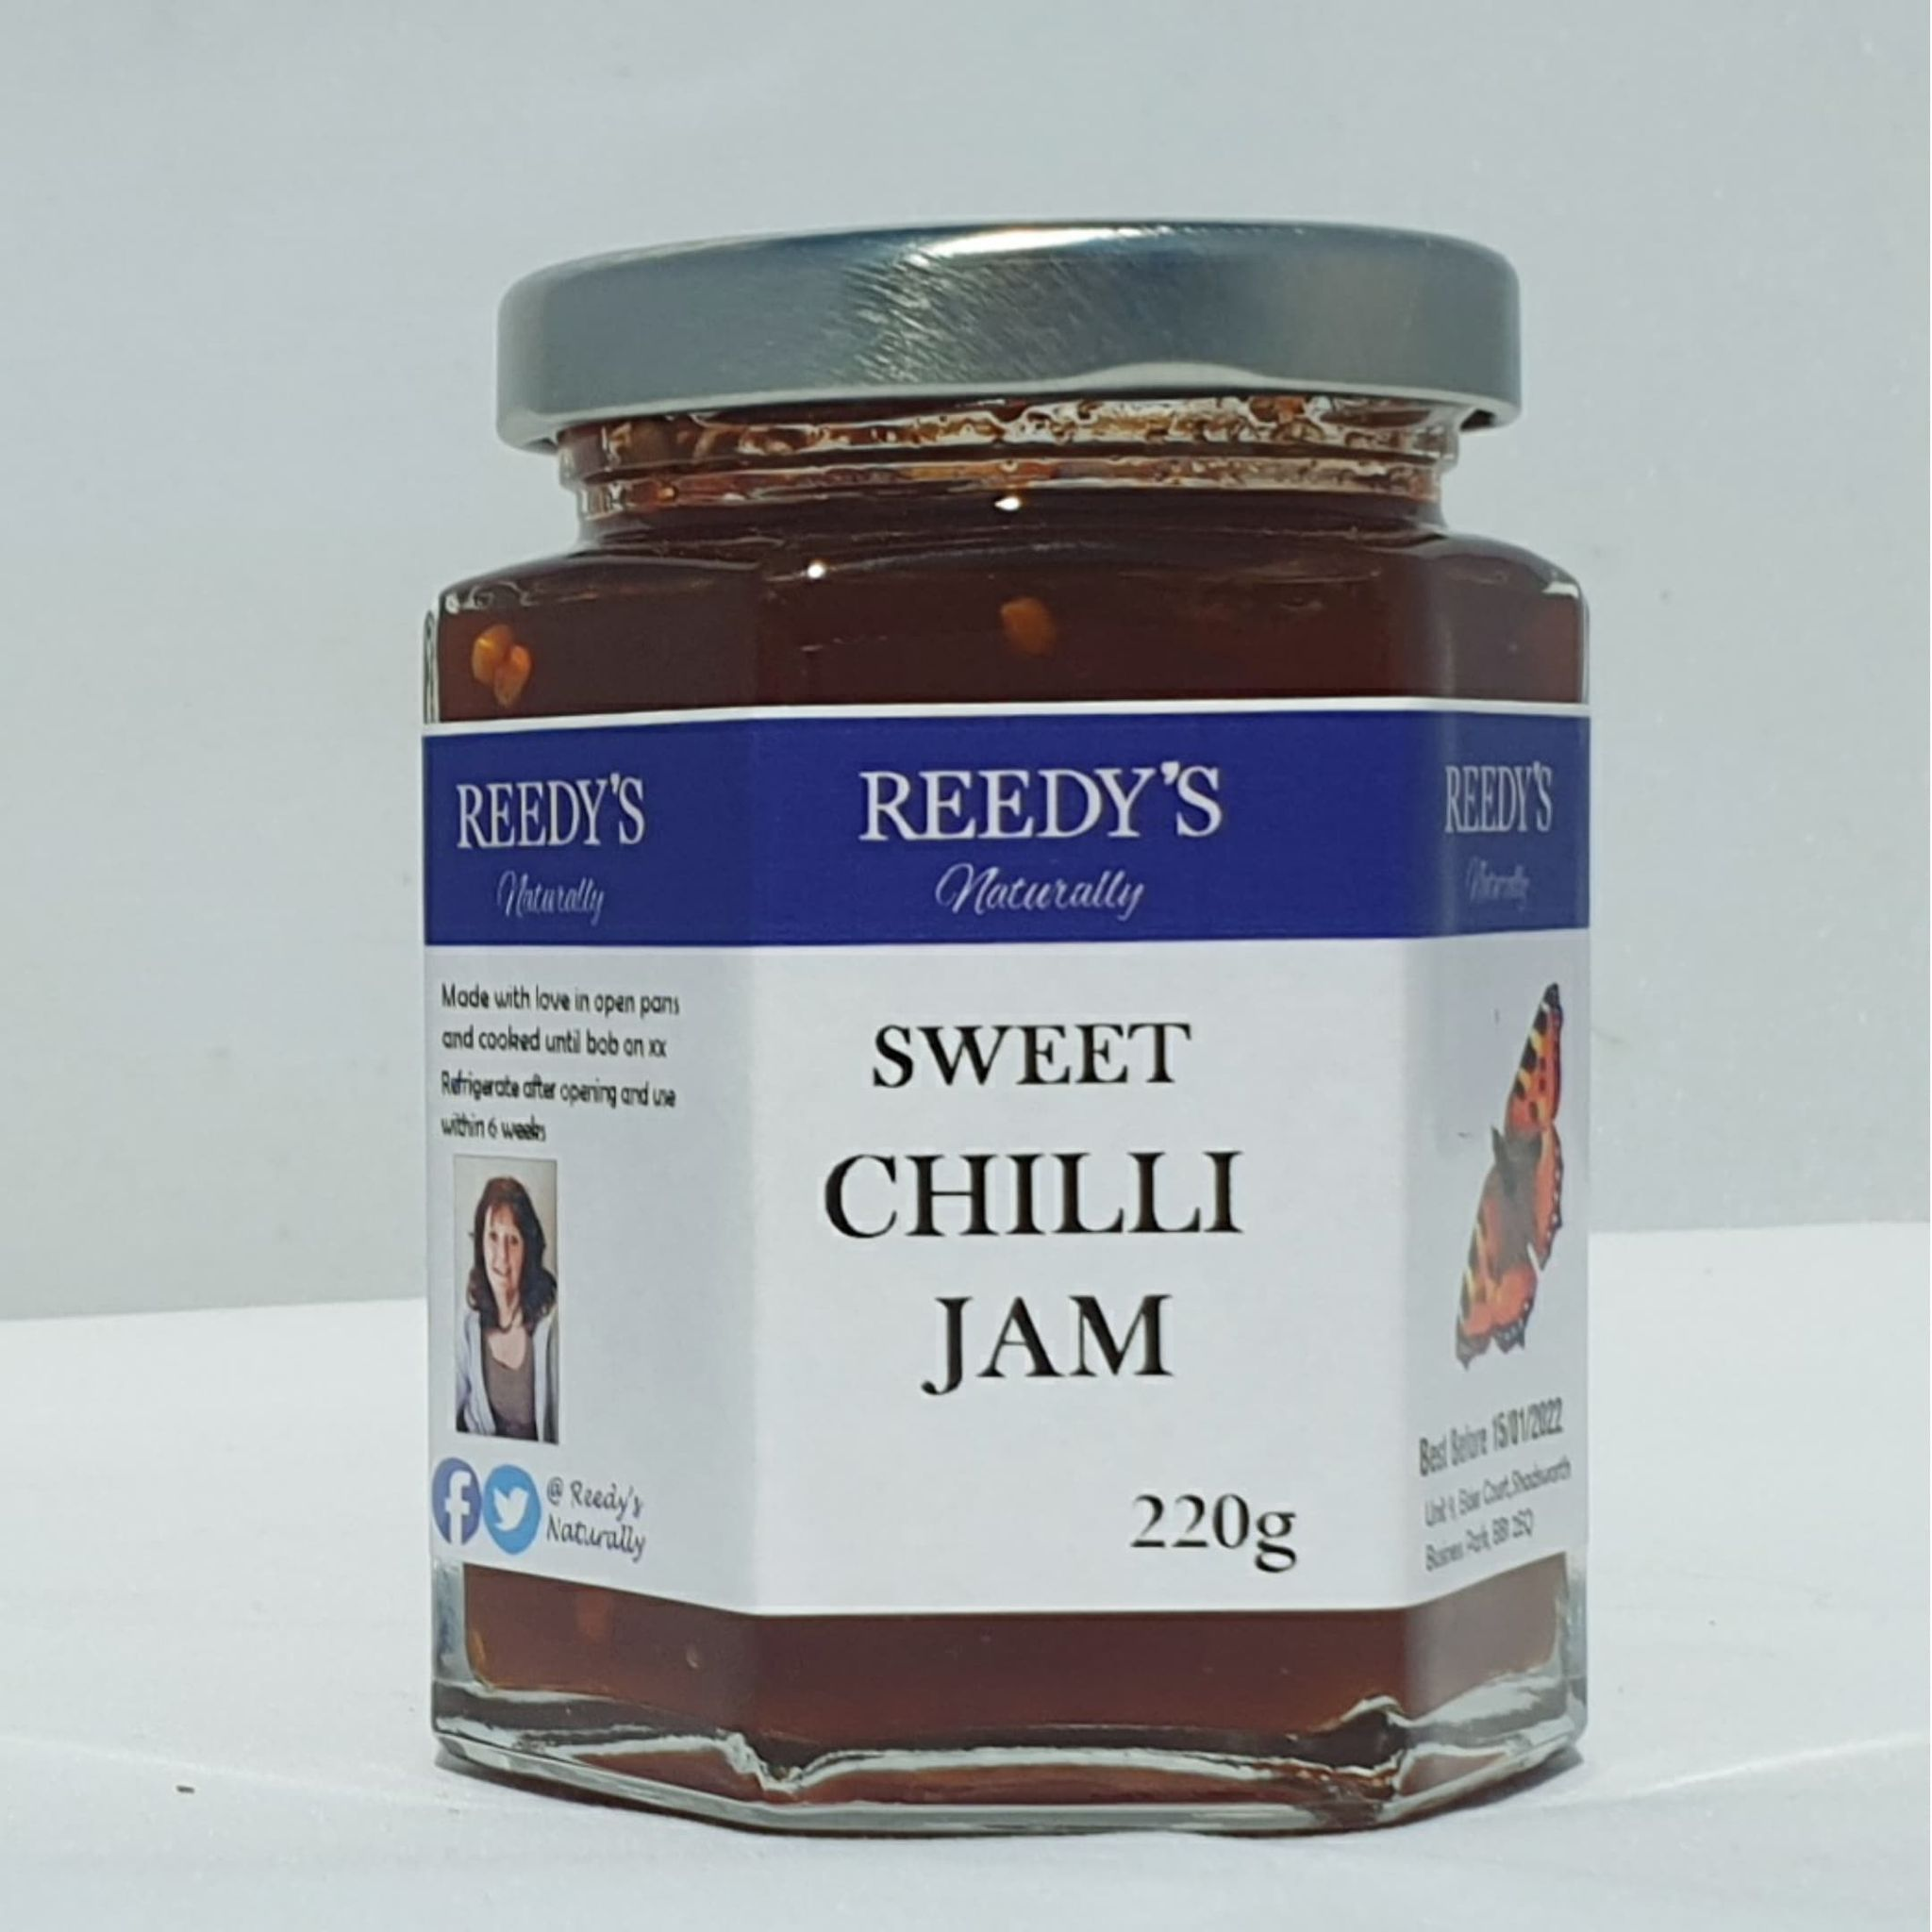 Reedy's Naturally - Jams & Chutn